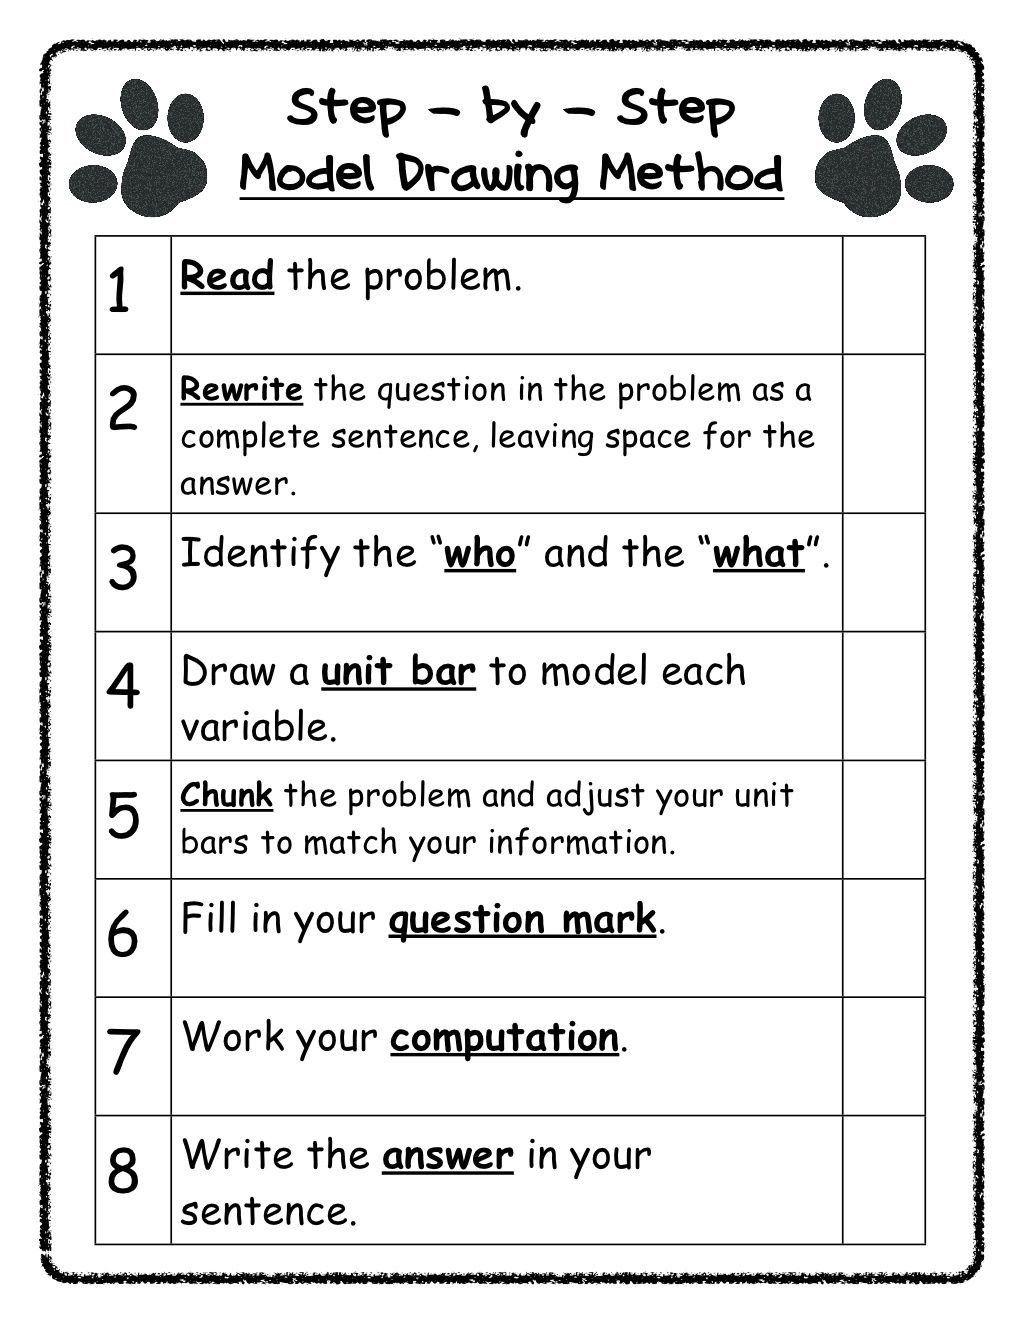 Bar Models Worksheets 2nd Grade Model Drawing Steps Singapore Math Bar Model 2nd Grade Math Worksheets